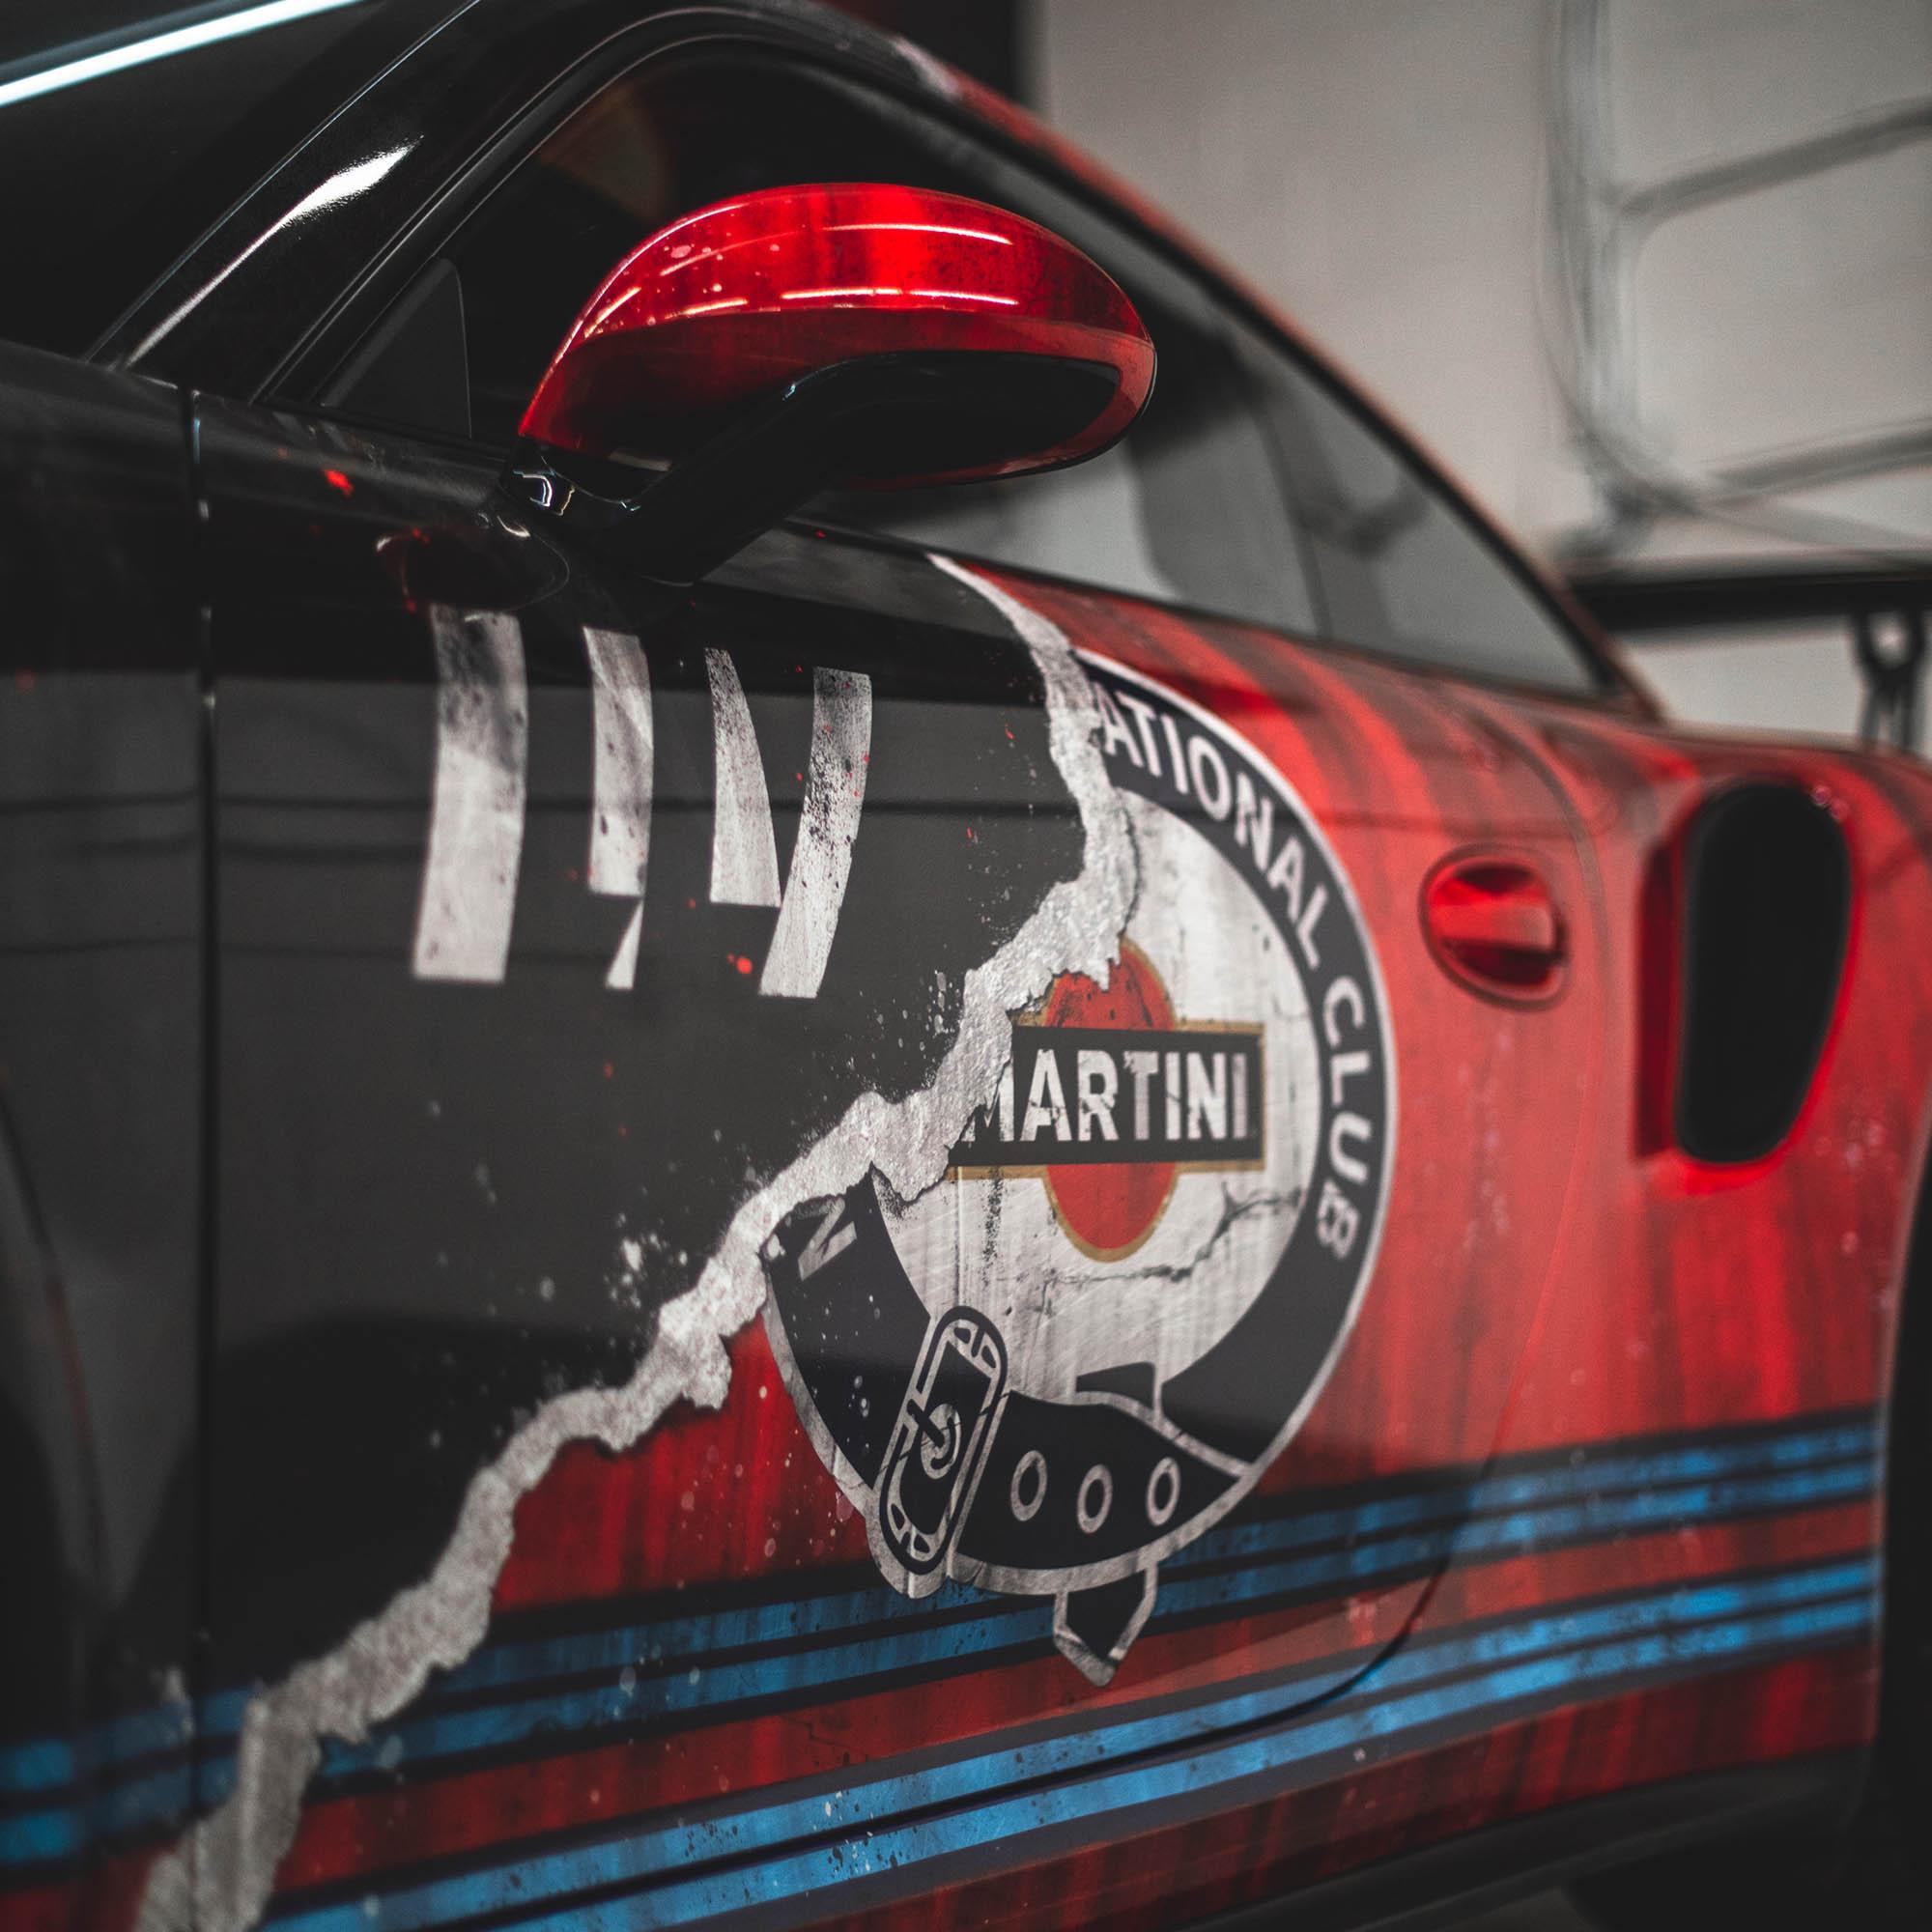 PORSCHE GT3RS LLV MARTINI RACING JOYRIDE WRAP DESIGN PHOTOSHOOT 3